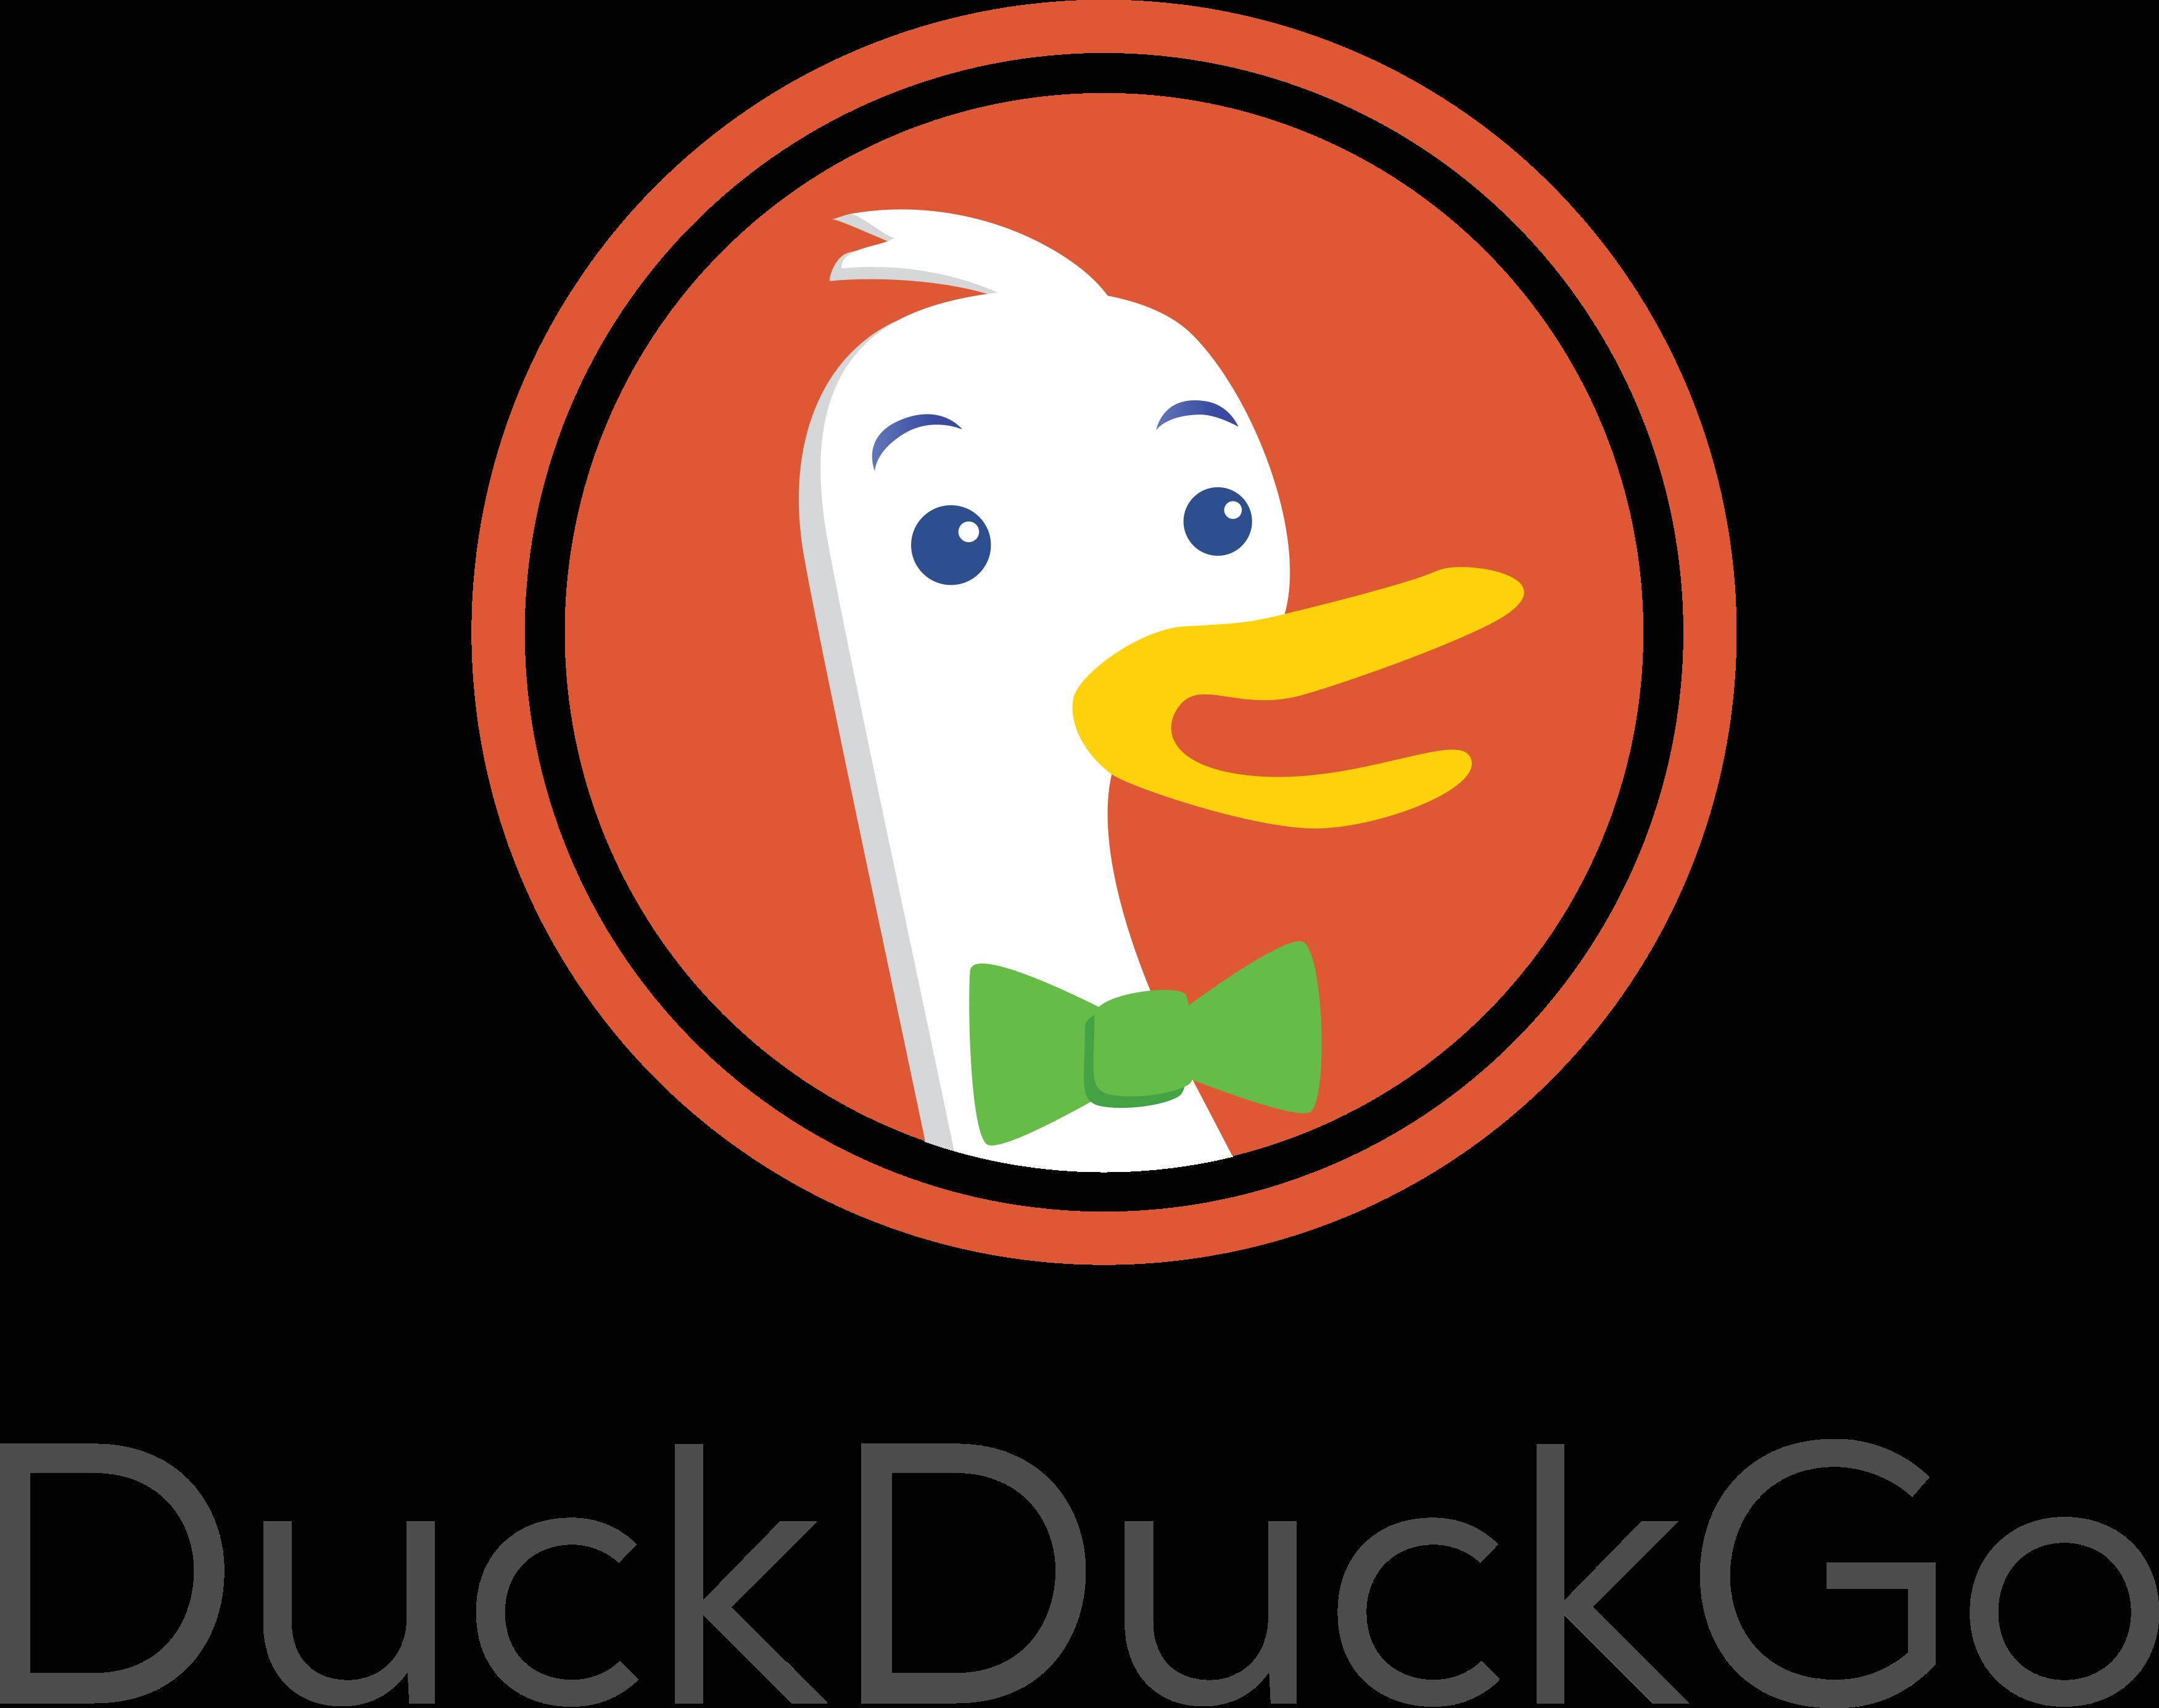 DuckDuck Go logo.